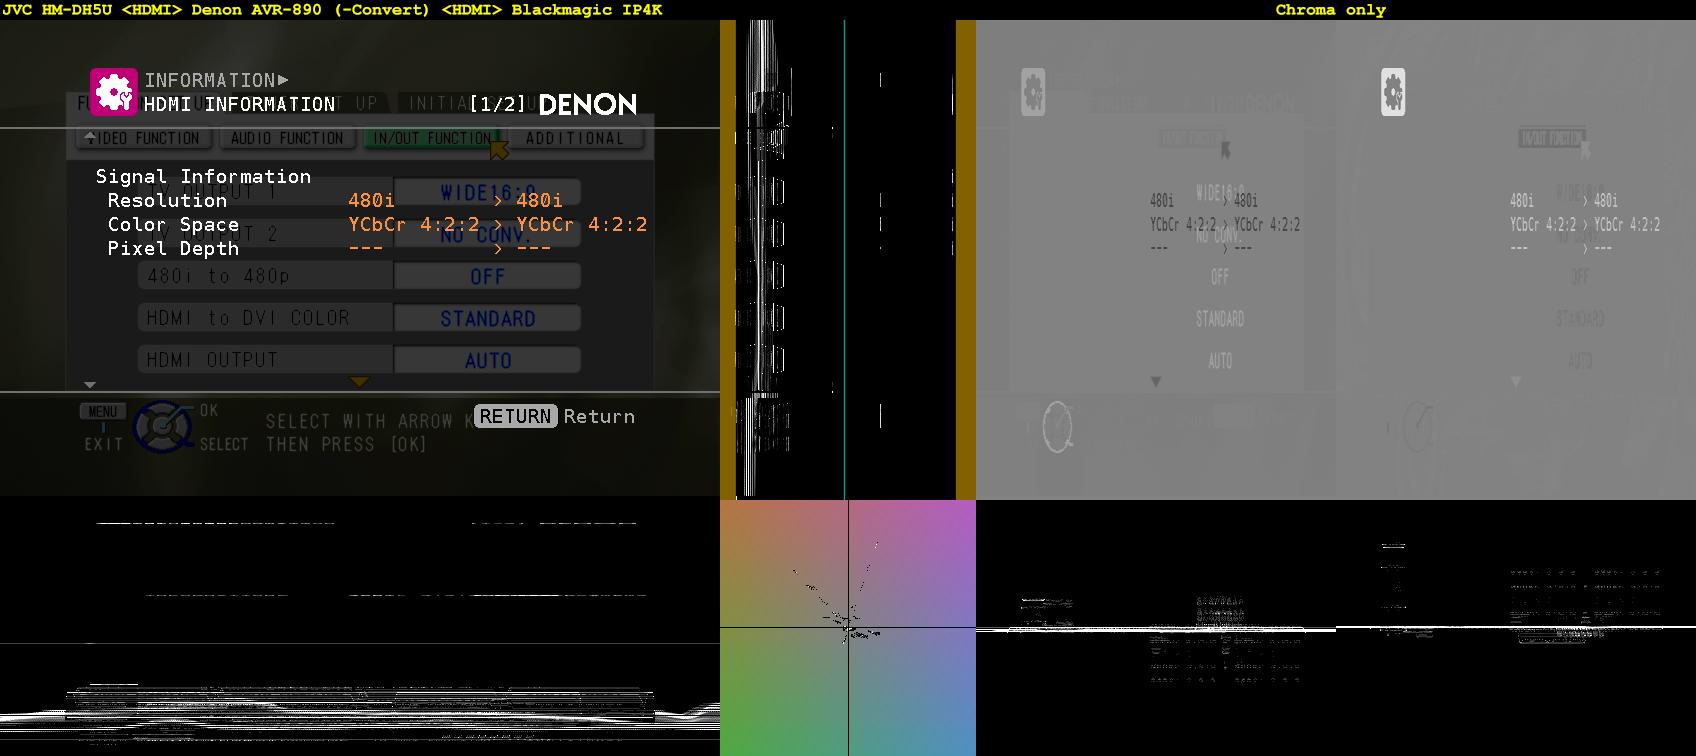 Click image for larger version  Name:Menu + Info - JVC HM-DH5U =HDMI= Denon AVR-890, -Convert =HDMI= IP4K.png Views:3708 Size:271.2 KB ID:35273